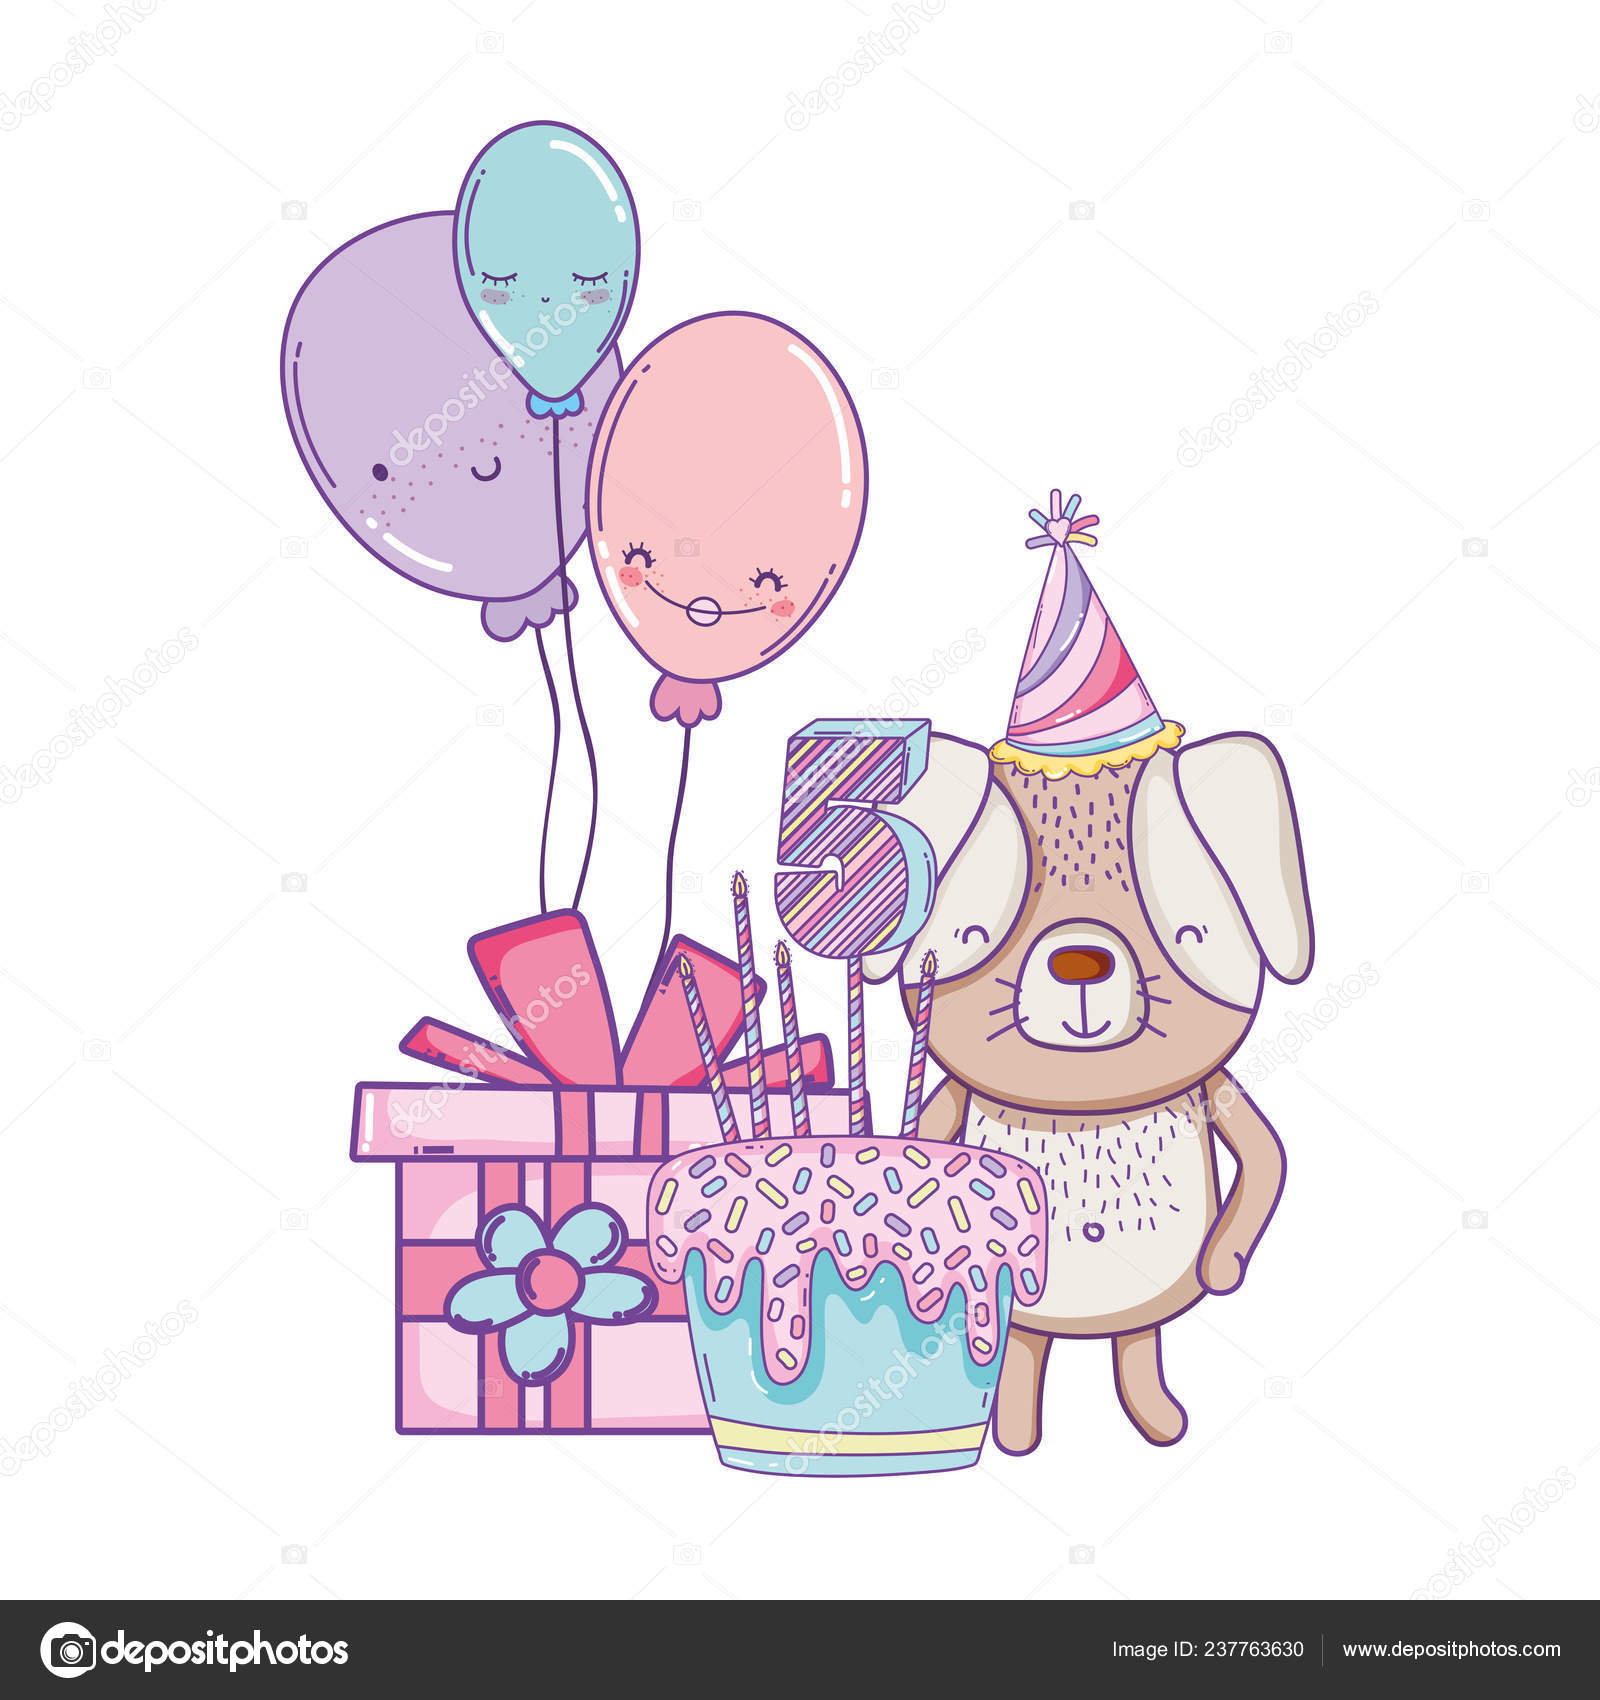 Happy Birthday Dog Cake Balloons Gift Box Cartoons Vector Illustration Stock Vector C Stockgiu 237763630